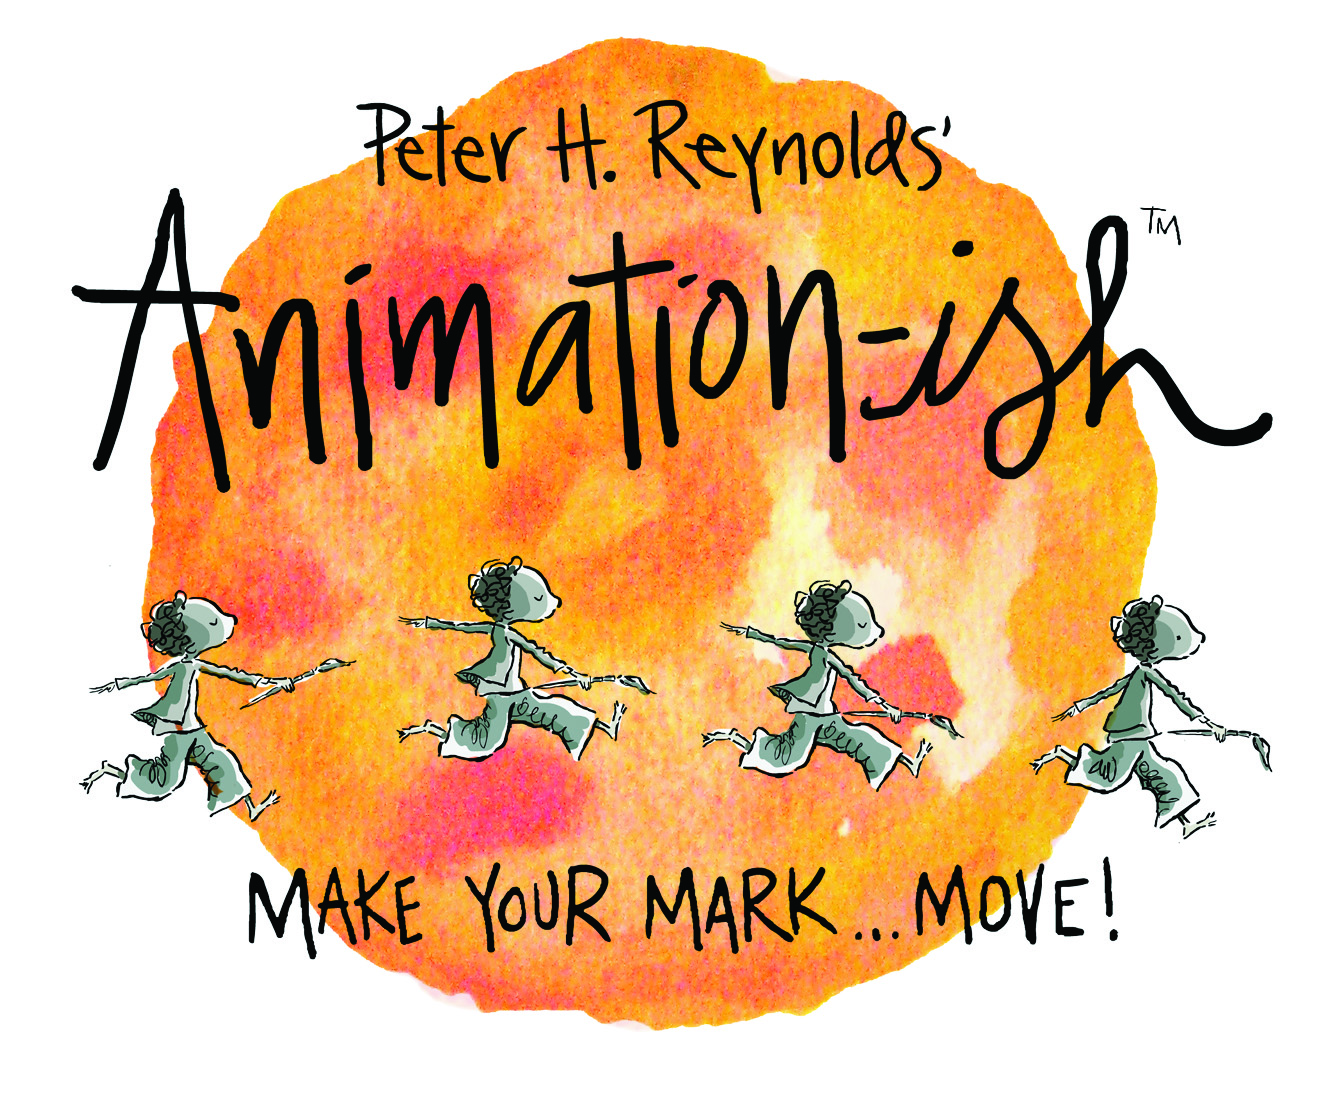 Animation-ish